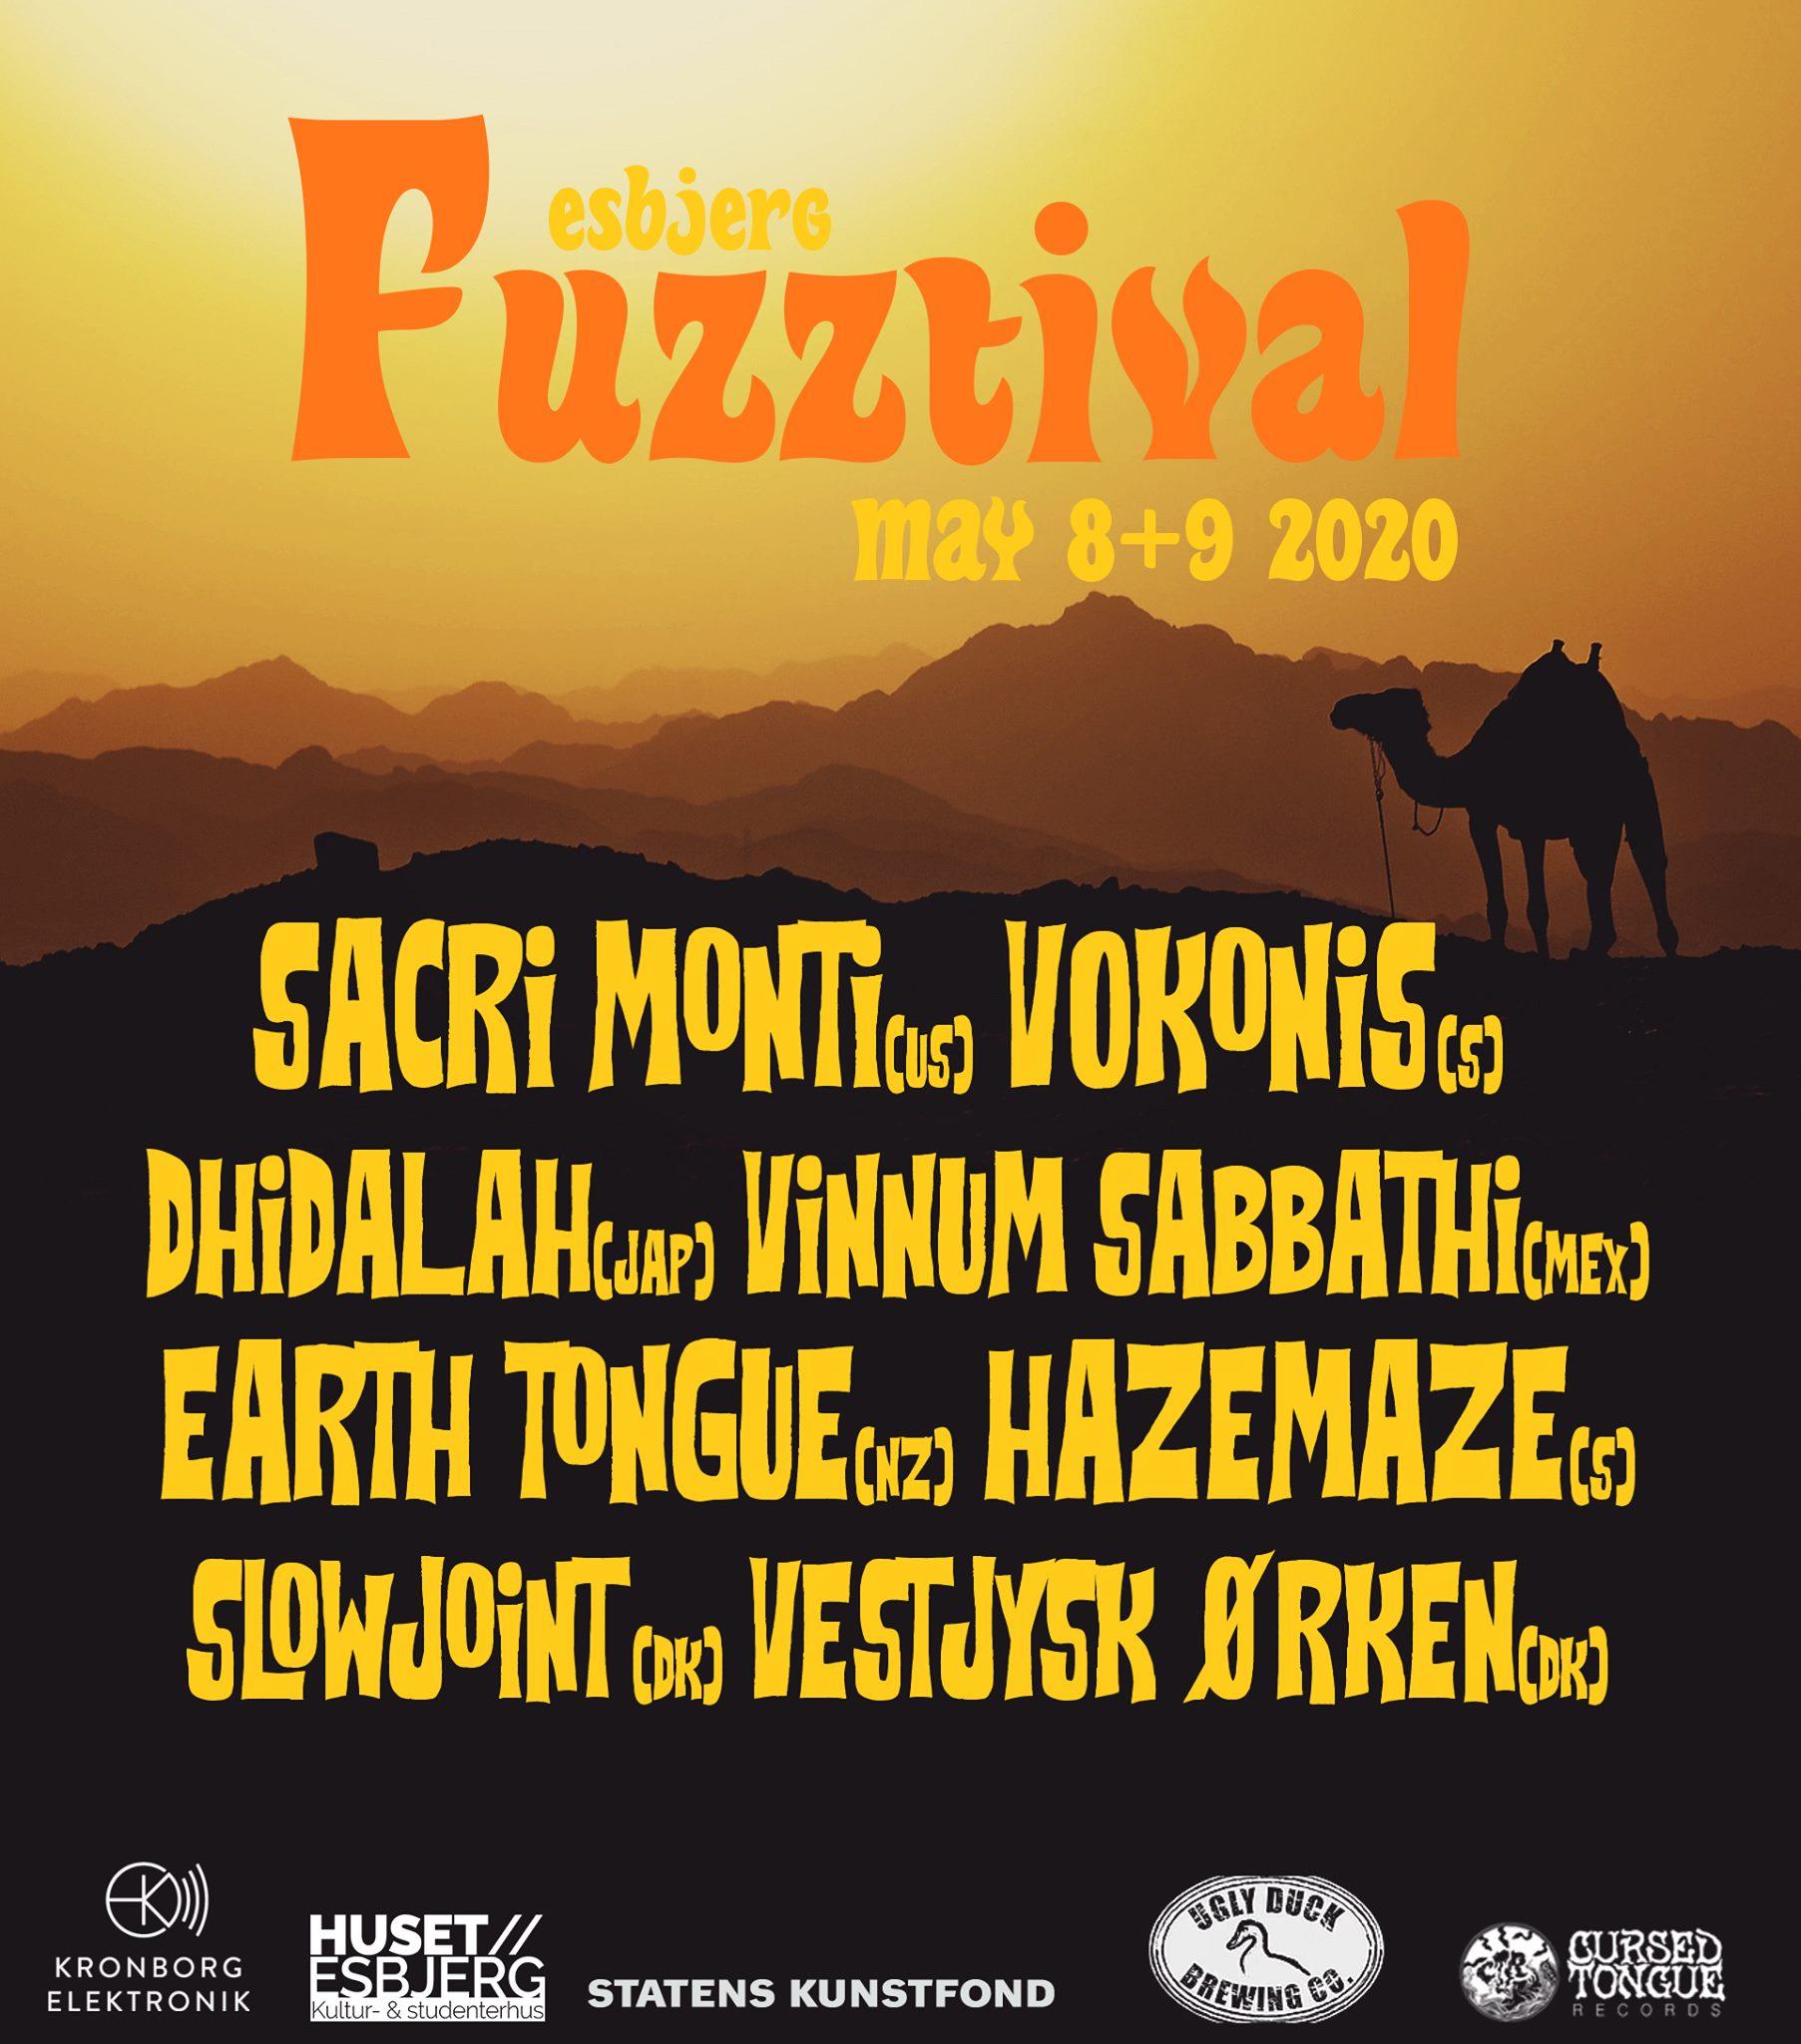 esbjerg fuzztival 2020 second announcement